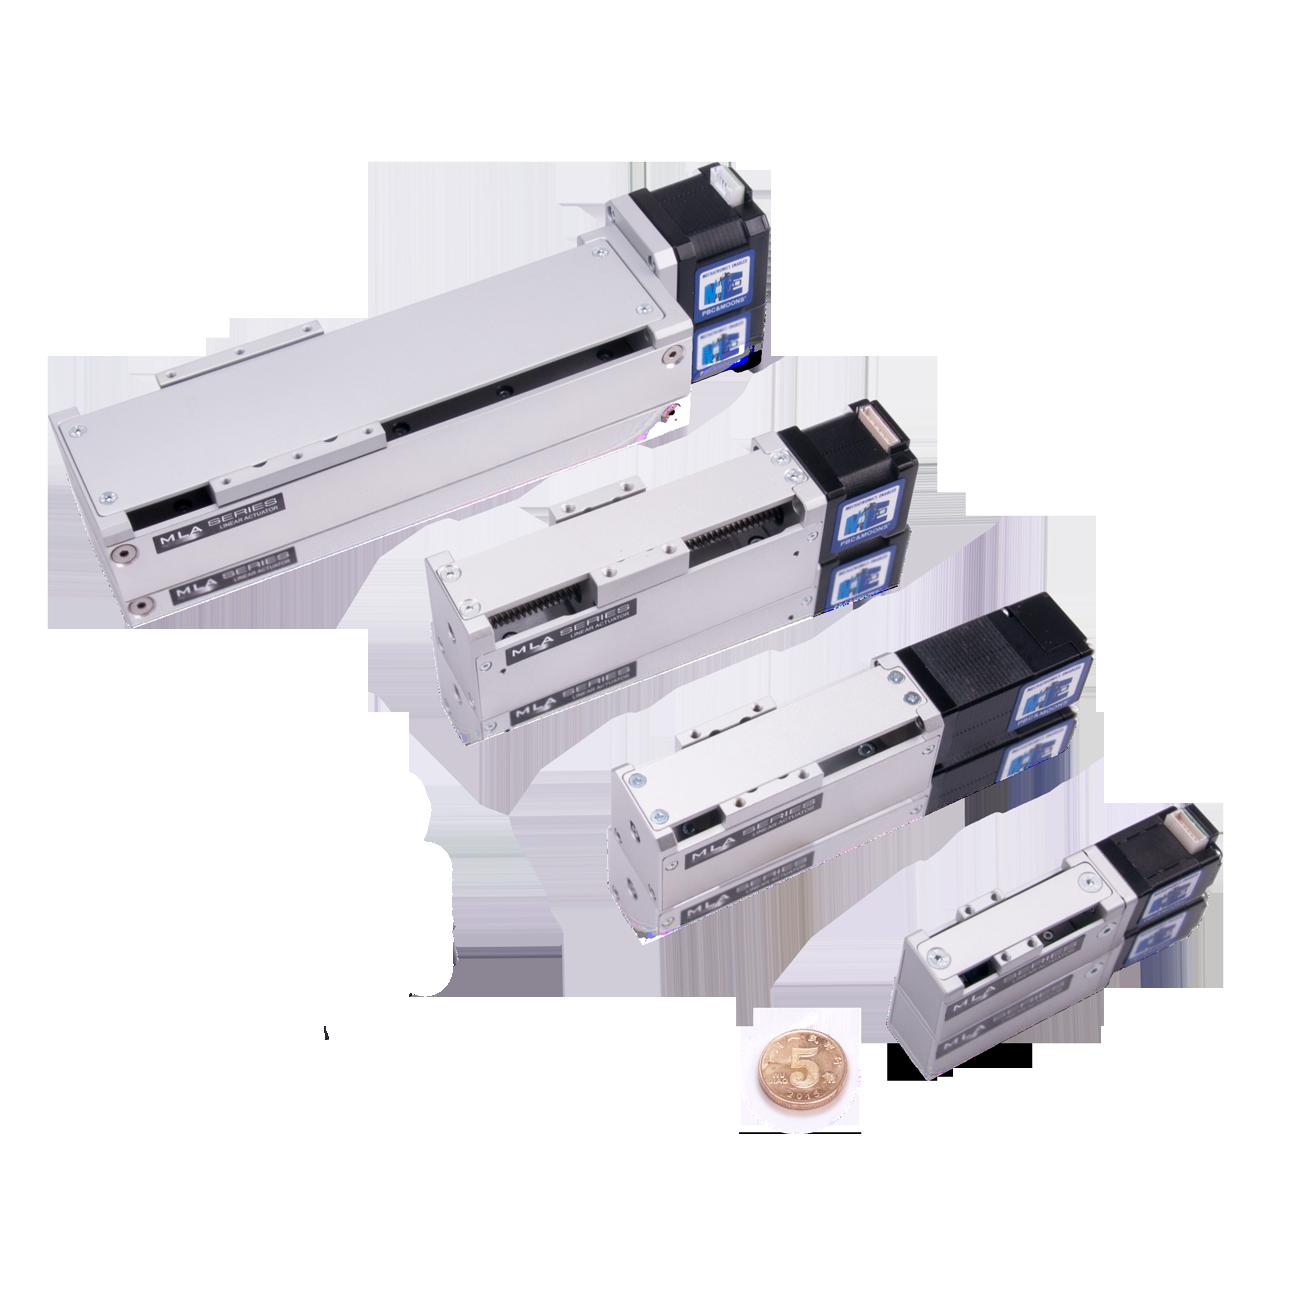 MLA Series Linear Actuators